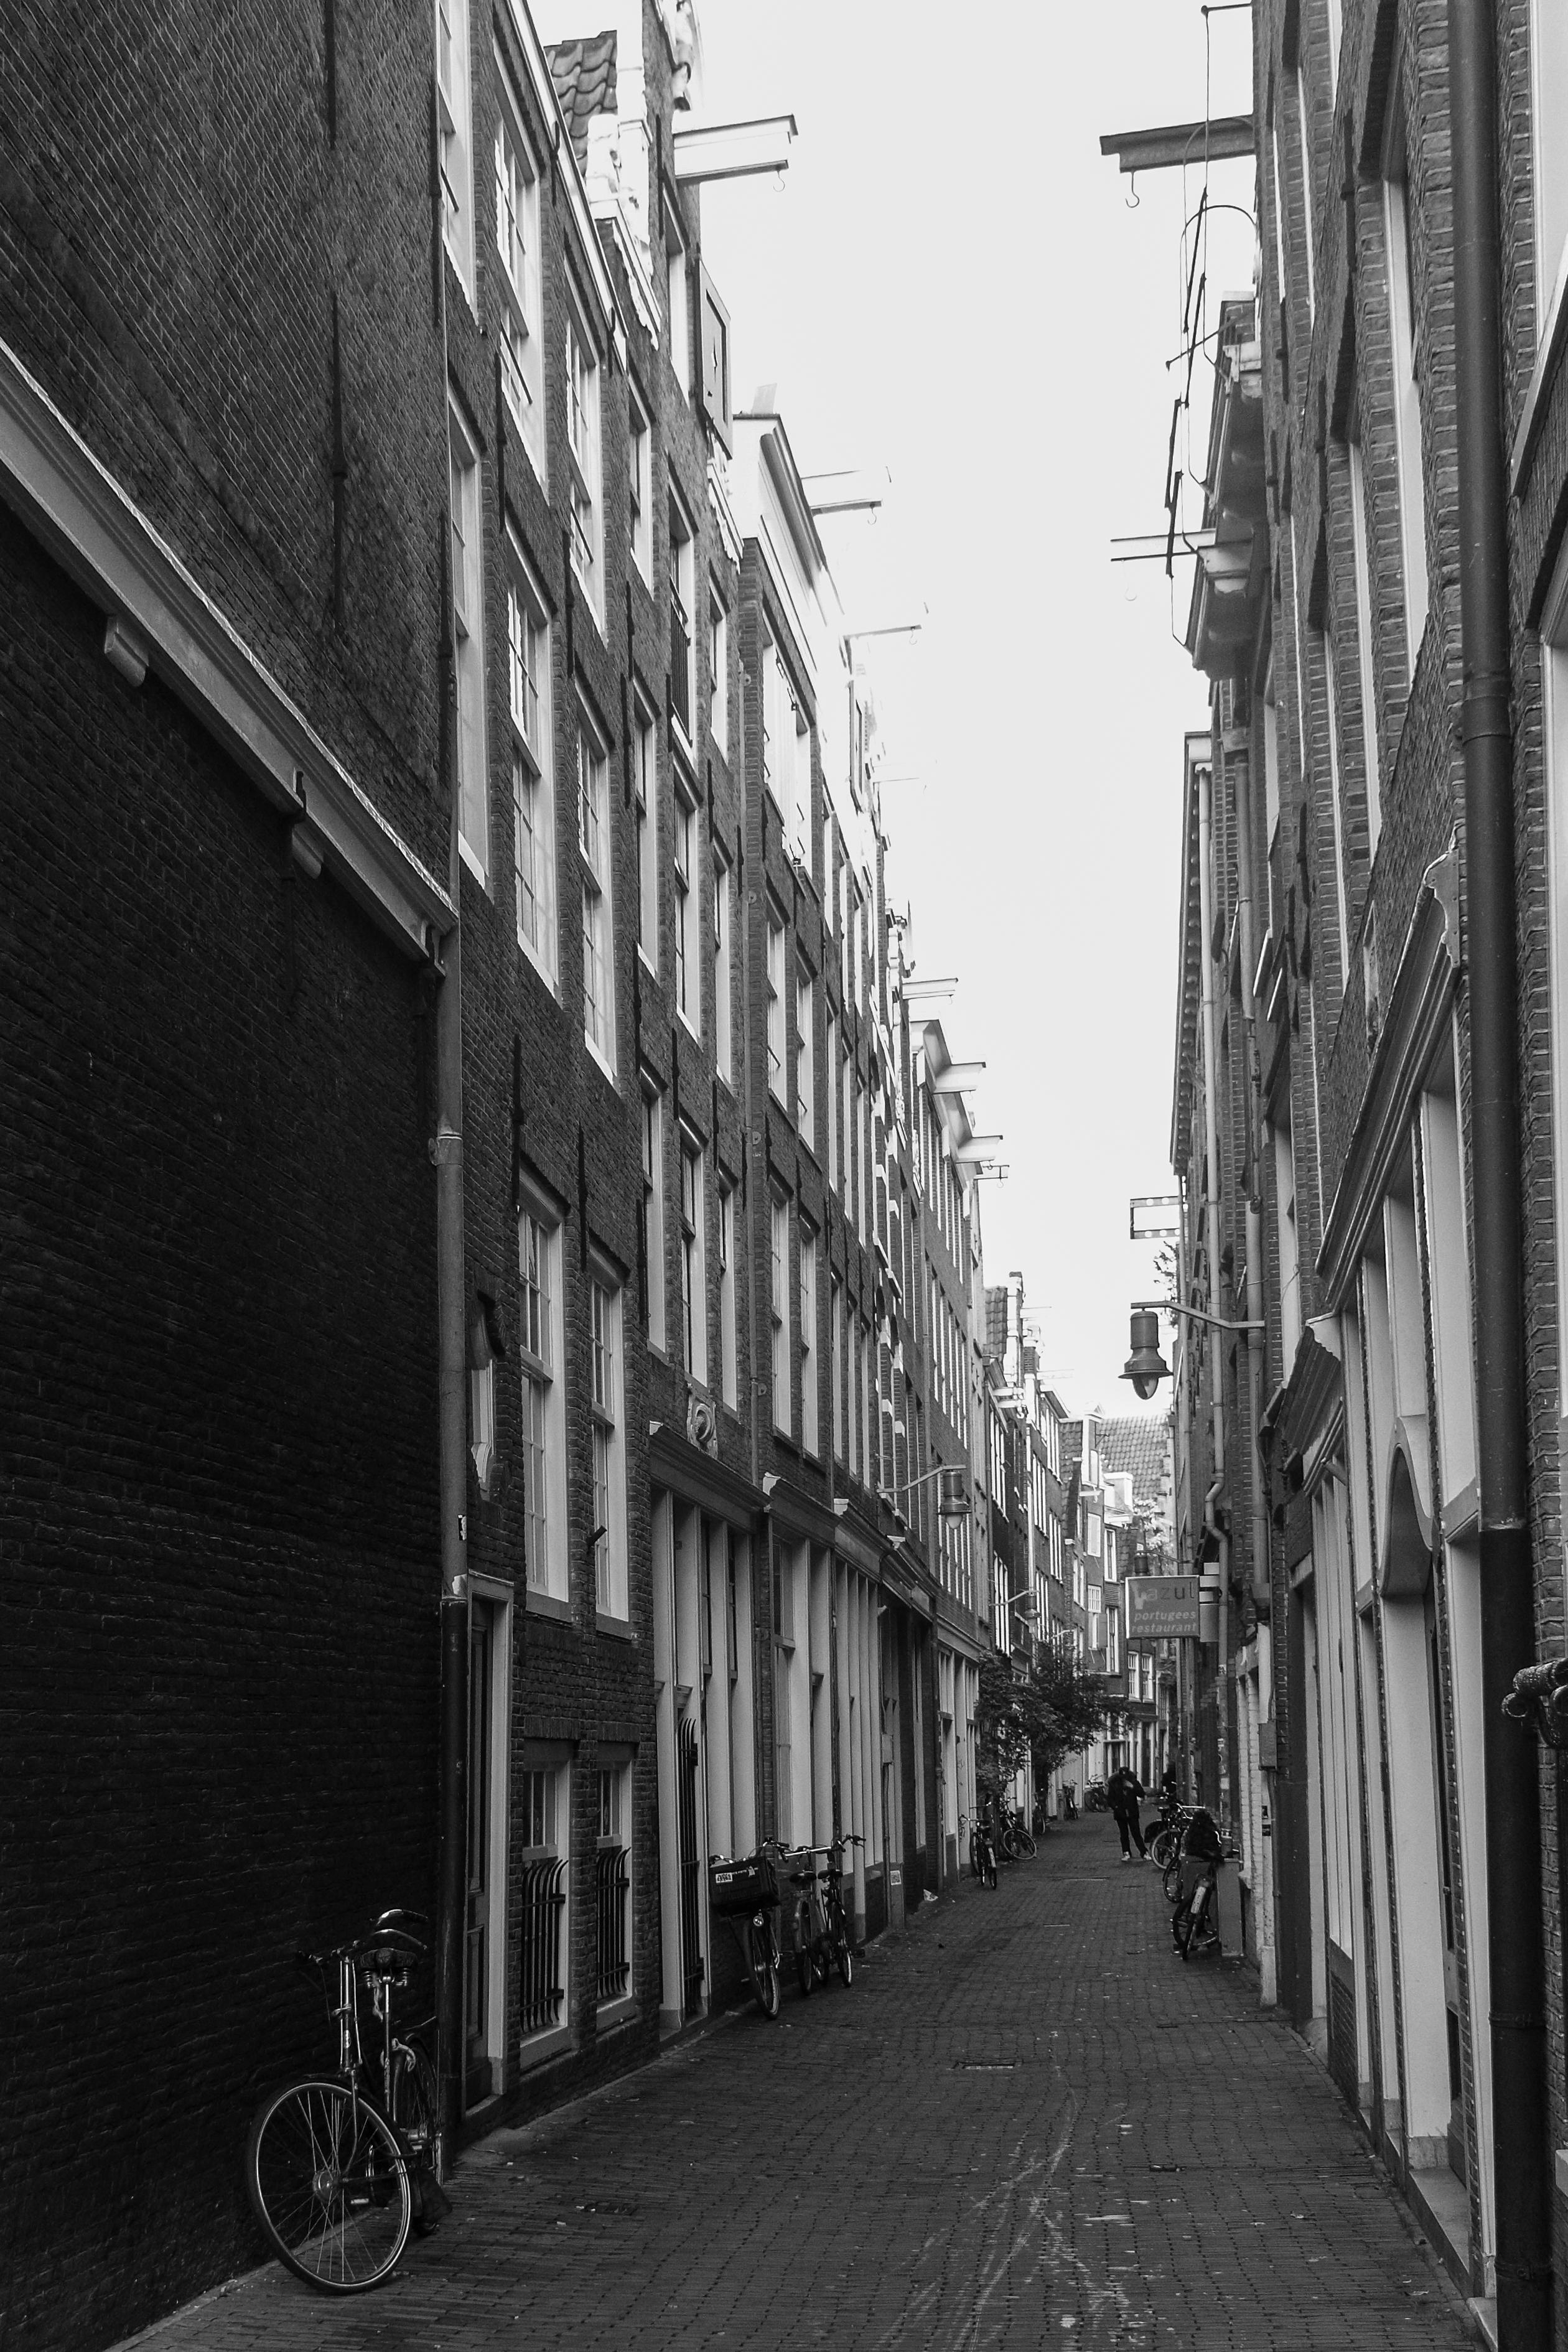 Alley, Amsterdam, Netherlands, Europe